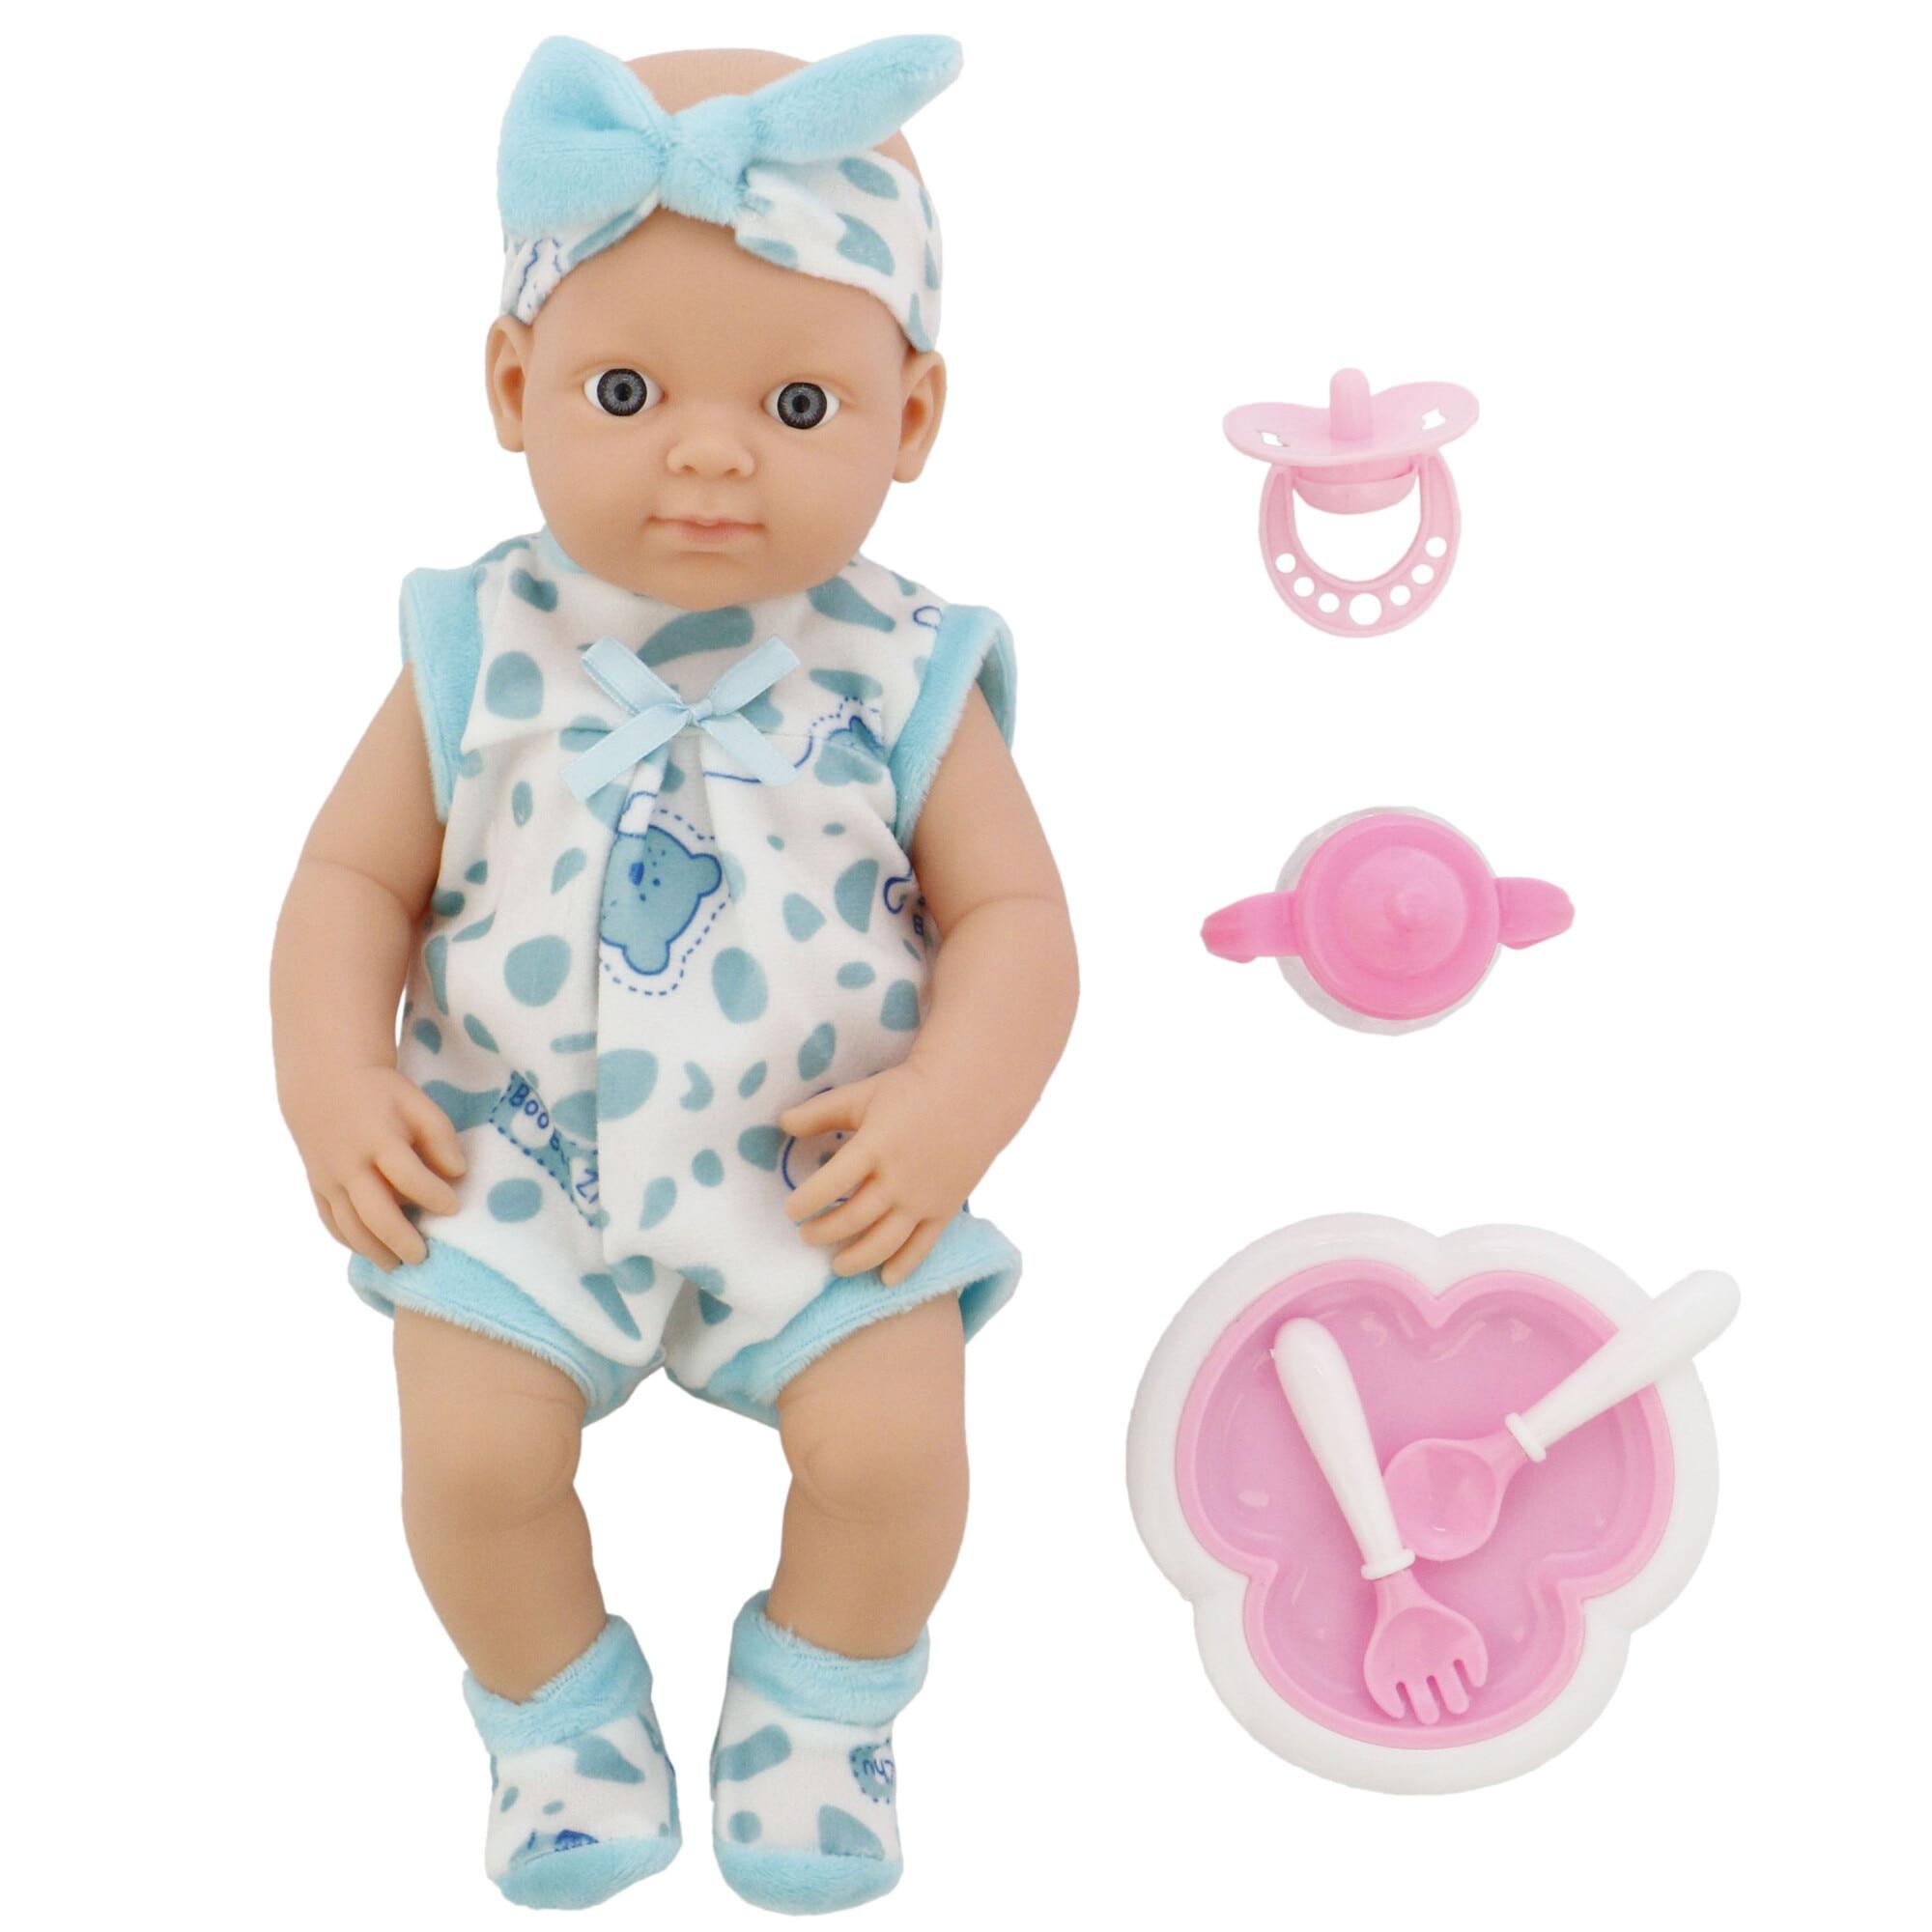 Fotografie Papusa bebelus M-Toys Baby 30 cm, cu accesorii, Alb / Bleu